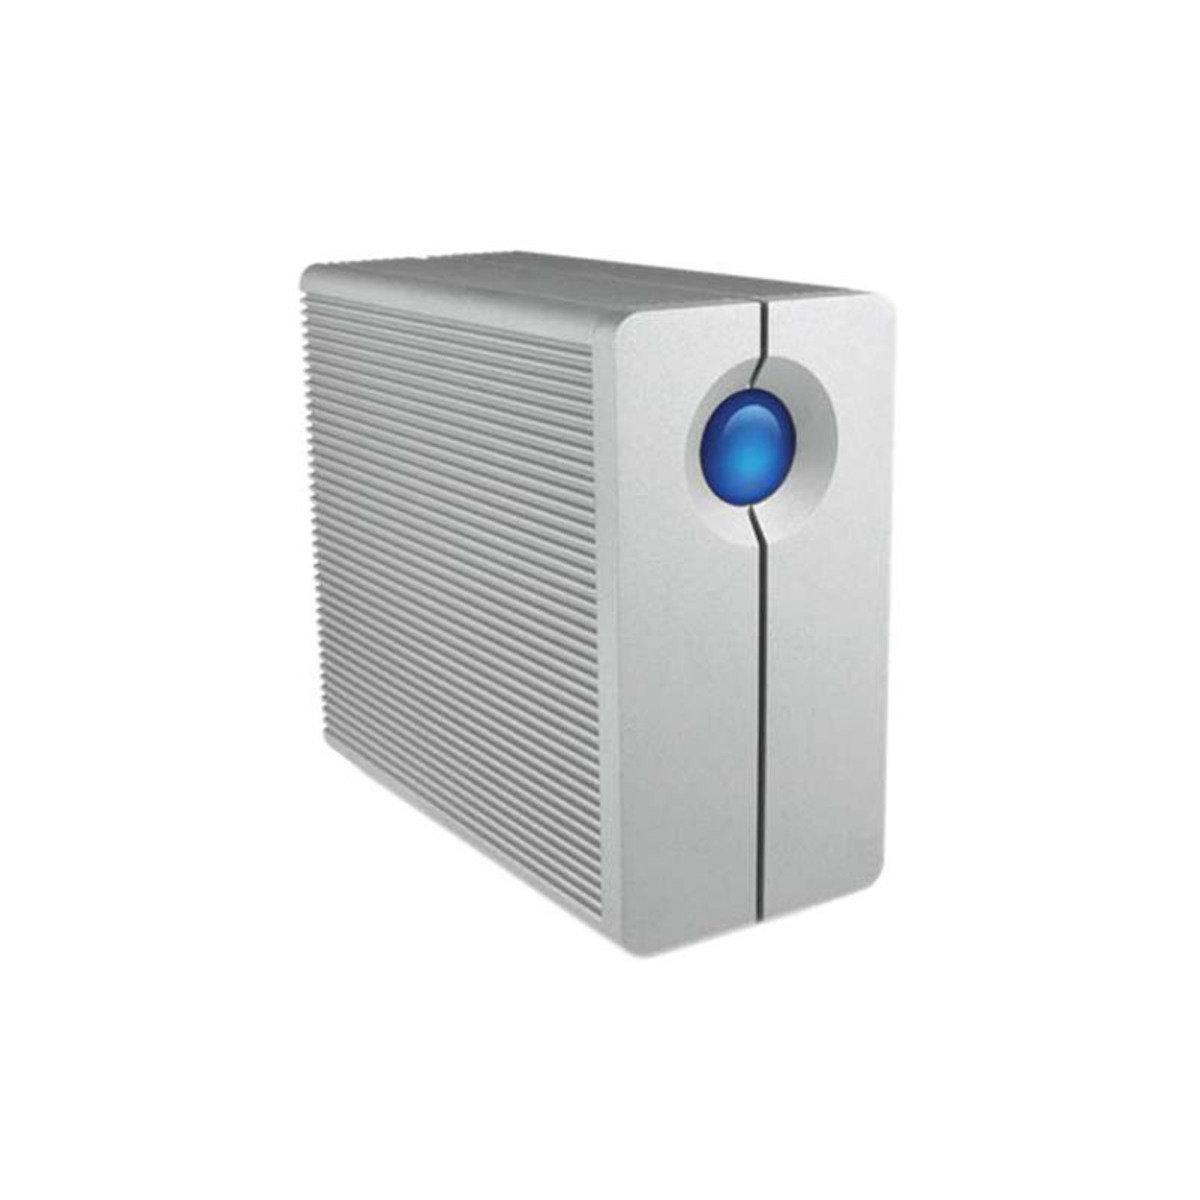 2big Quadra USB3.0 6TB 3.5吋 雙硬碟RAID外置硬碟 9000354